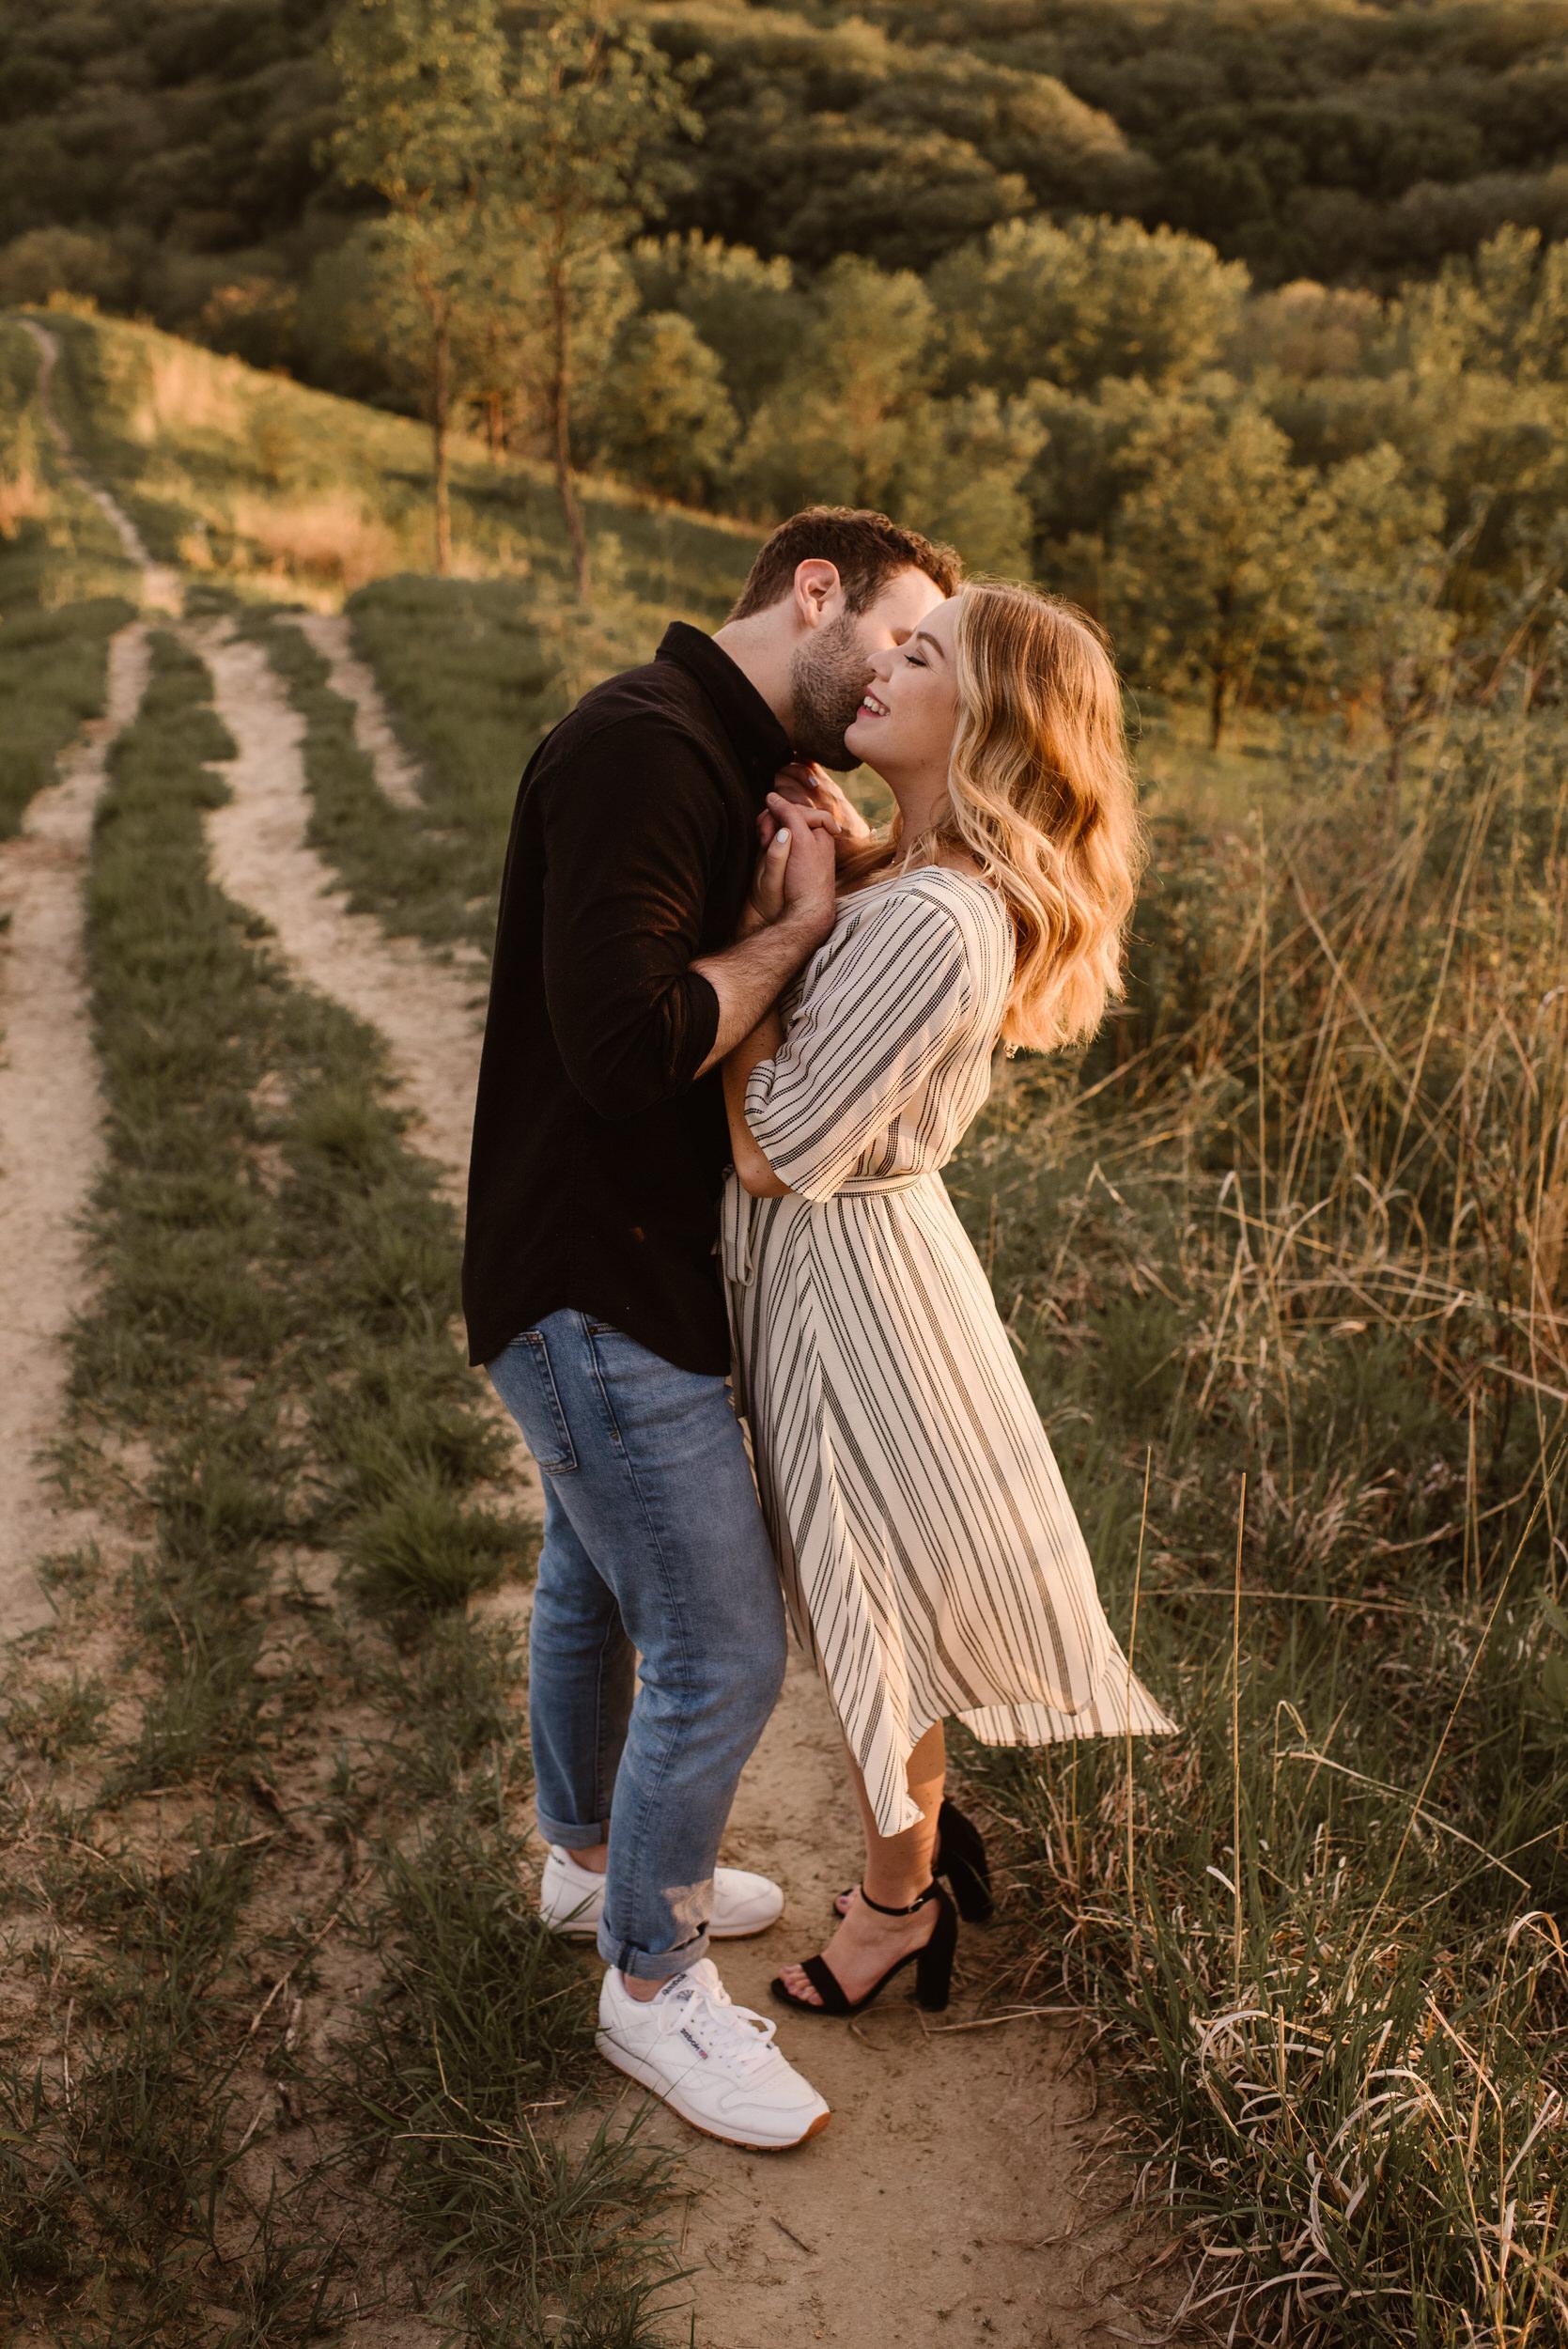 Omaha-Nebraska-Engagement-Session-Kaylie-Sirek-Photography-142.jpg